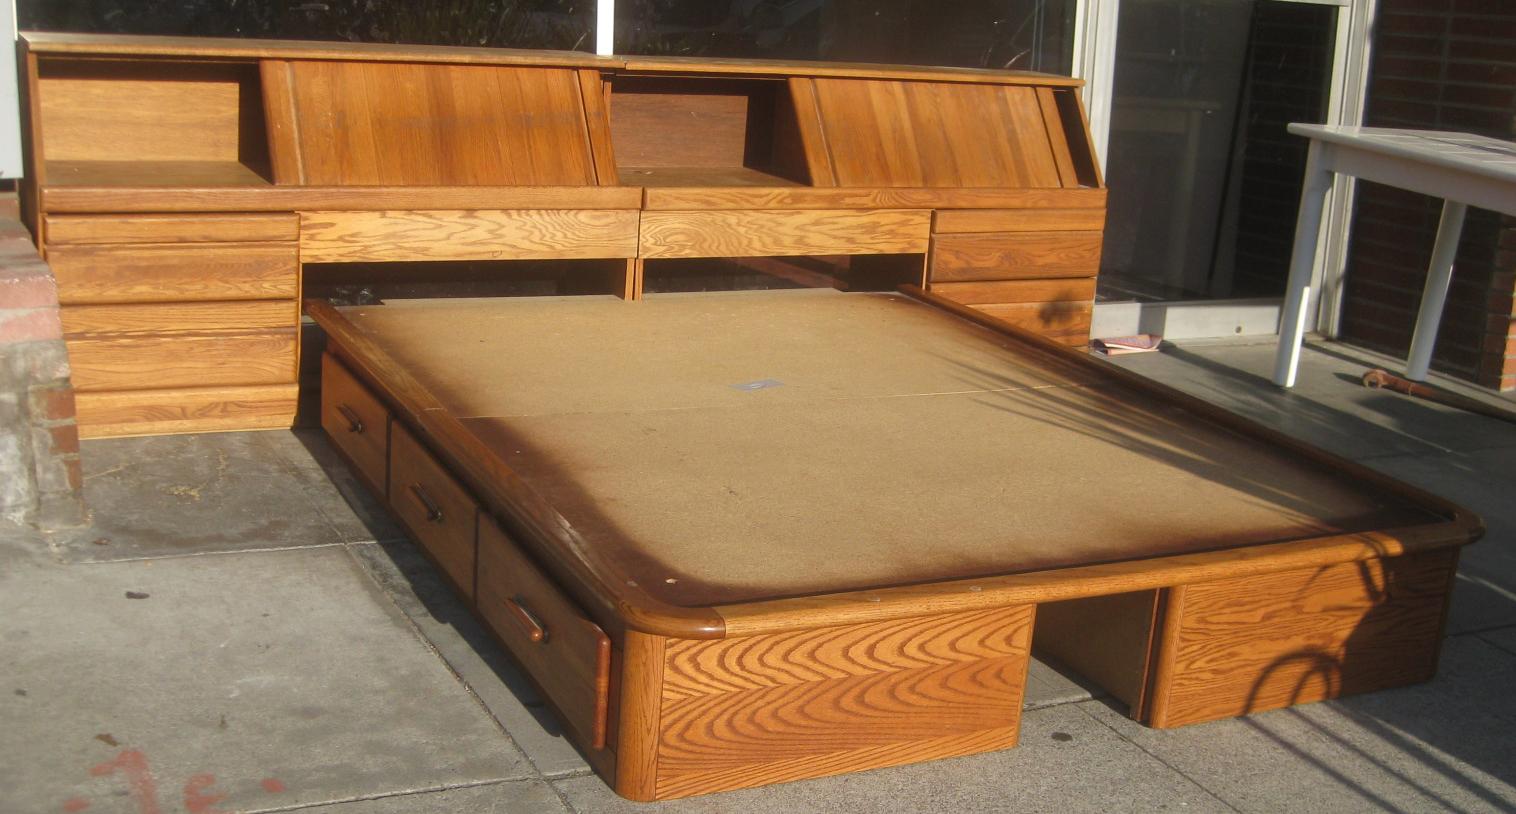 Uhuru furniture collectibles sold queen captain 39 s bed 60 - Captains bed queen plans ...